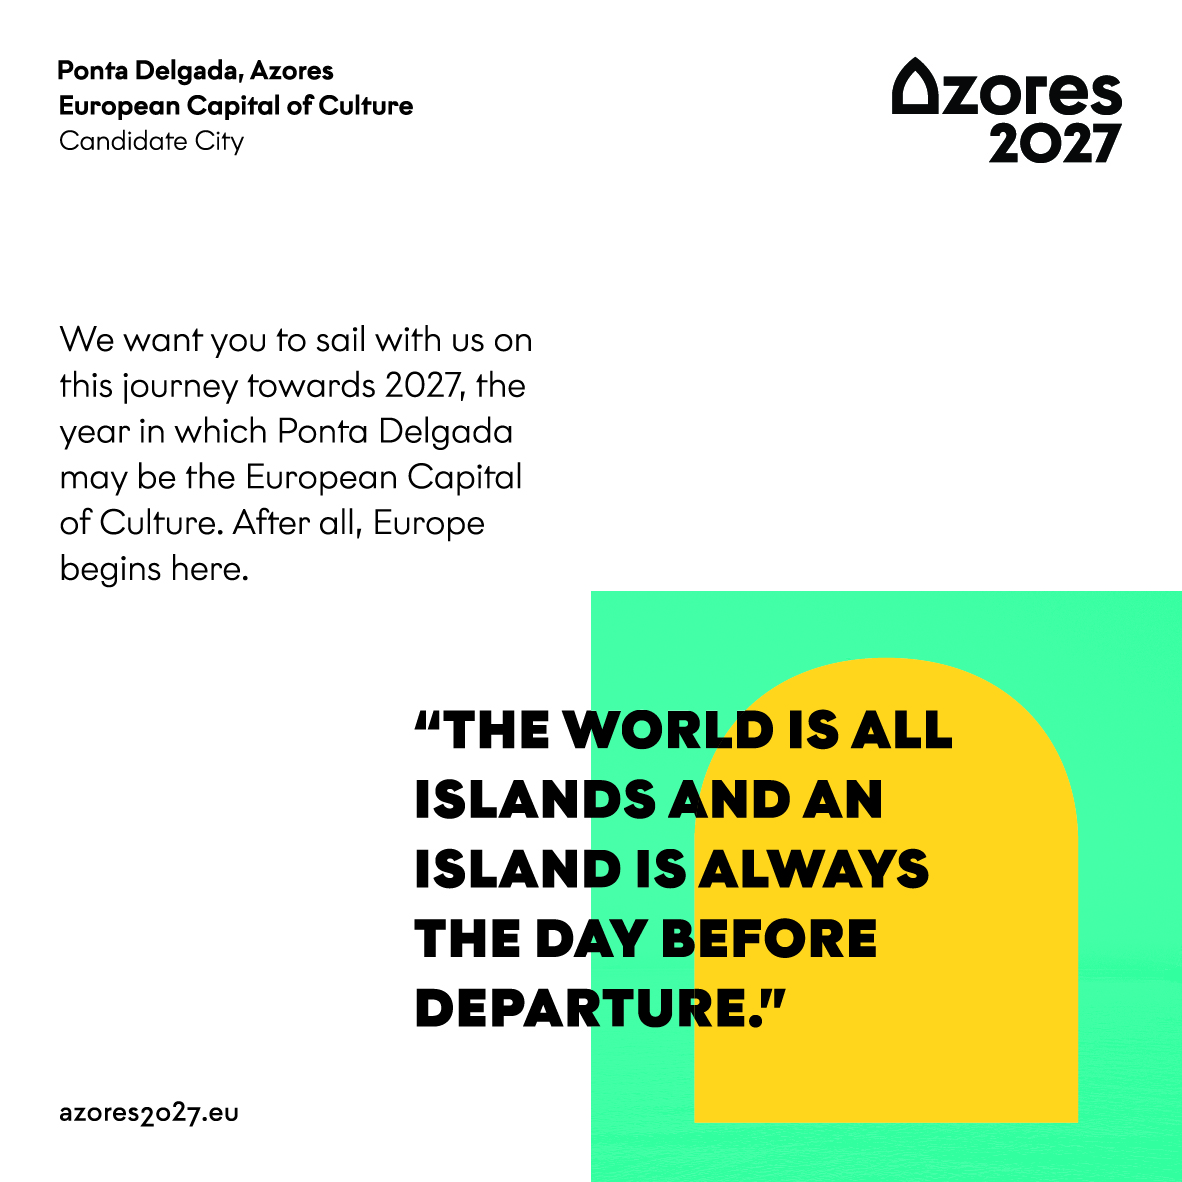 Azores 2027 – Ponta Delgada